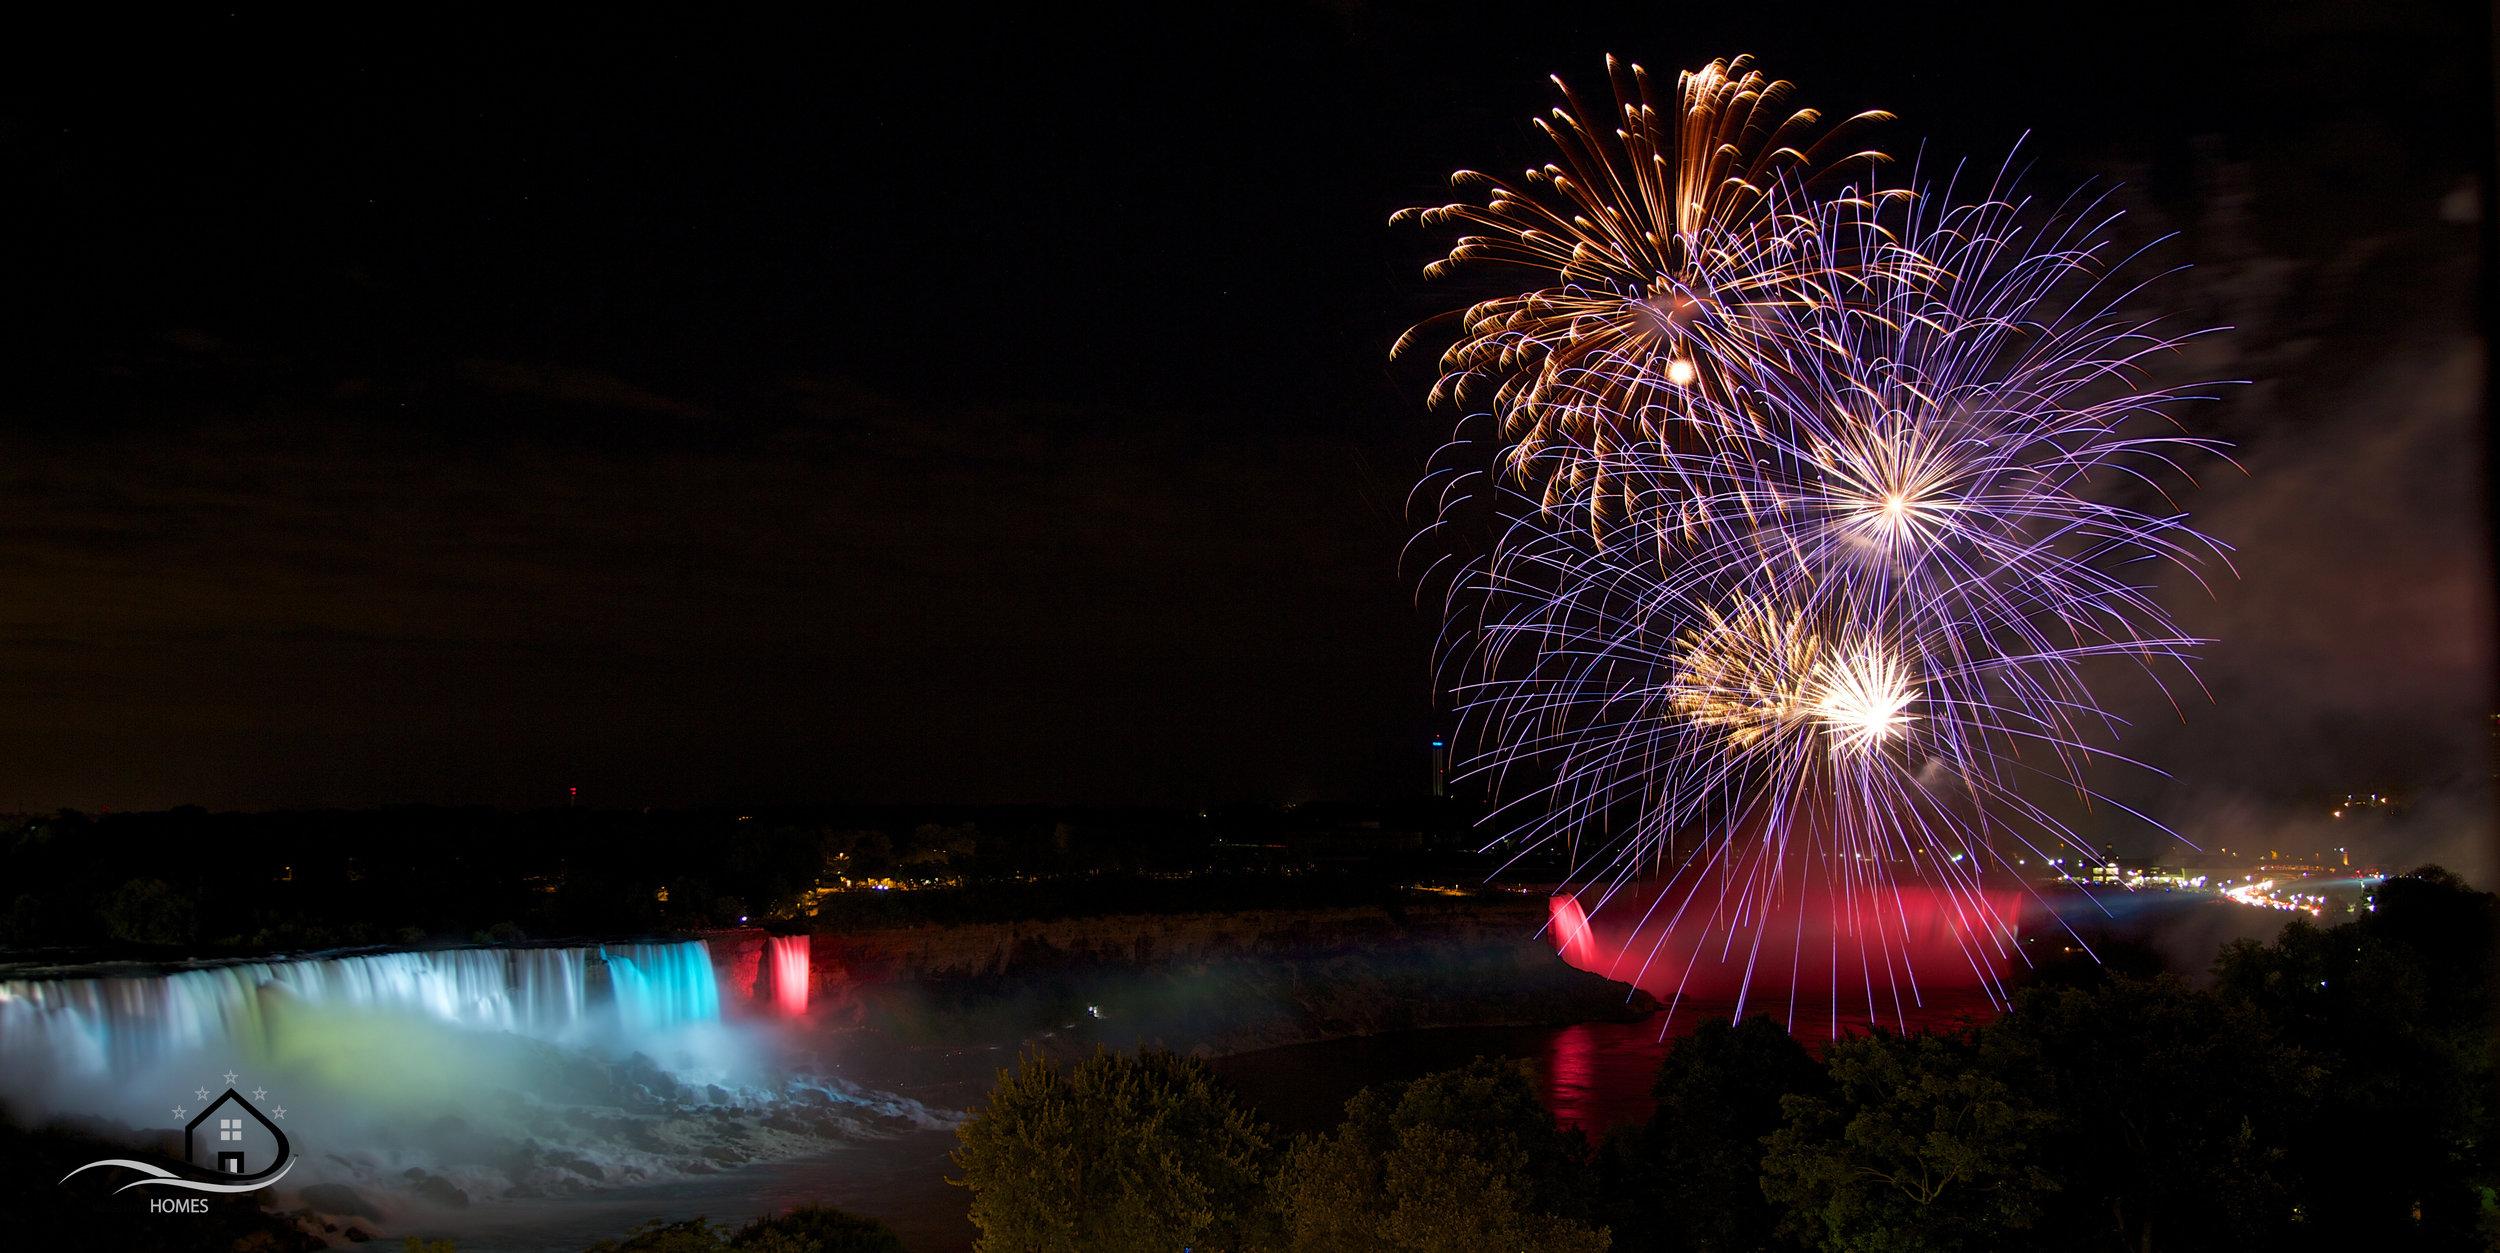 Fireworks_Over_Niagara_Falls copy.jpg